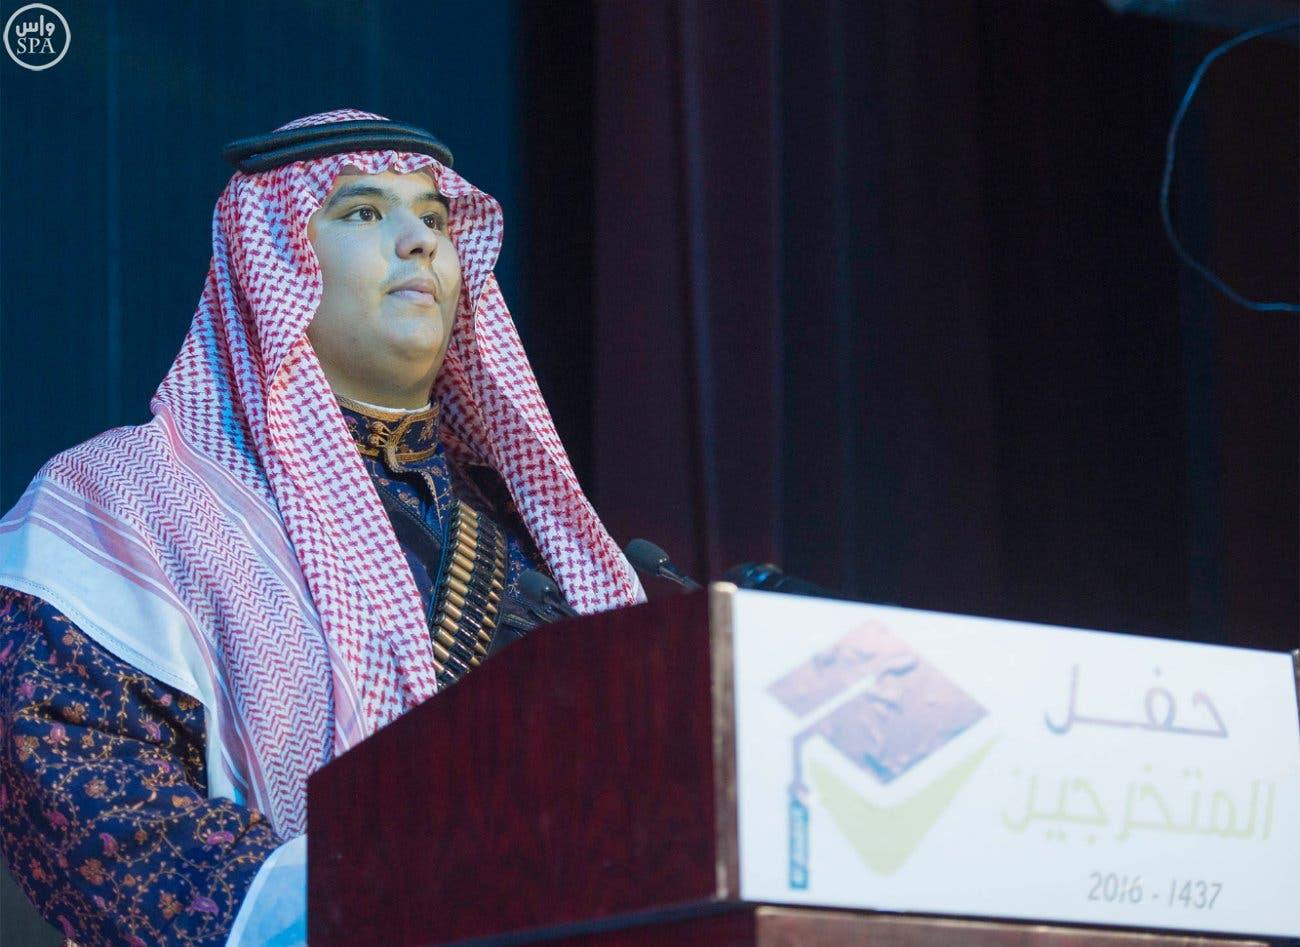 Prince Rakan is the youngest son of Saudi King Salman. (Photo courtesy: Bandar al-Jaloud)